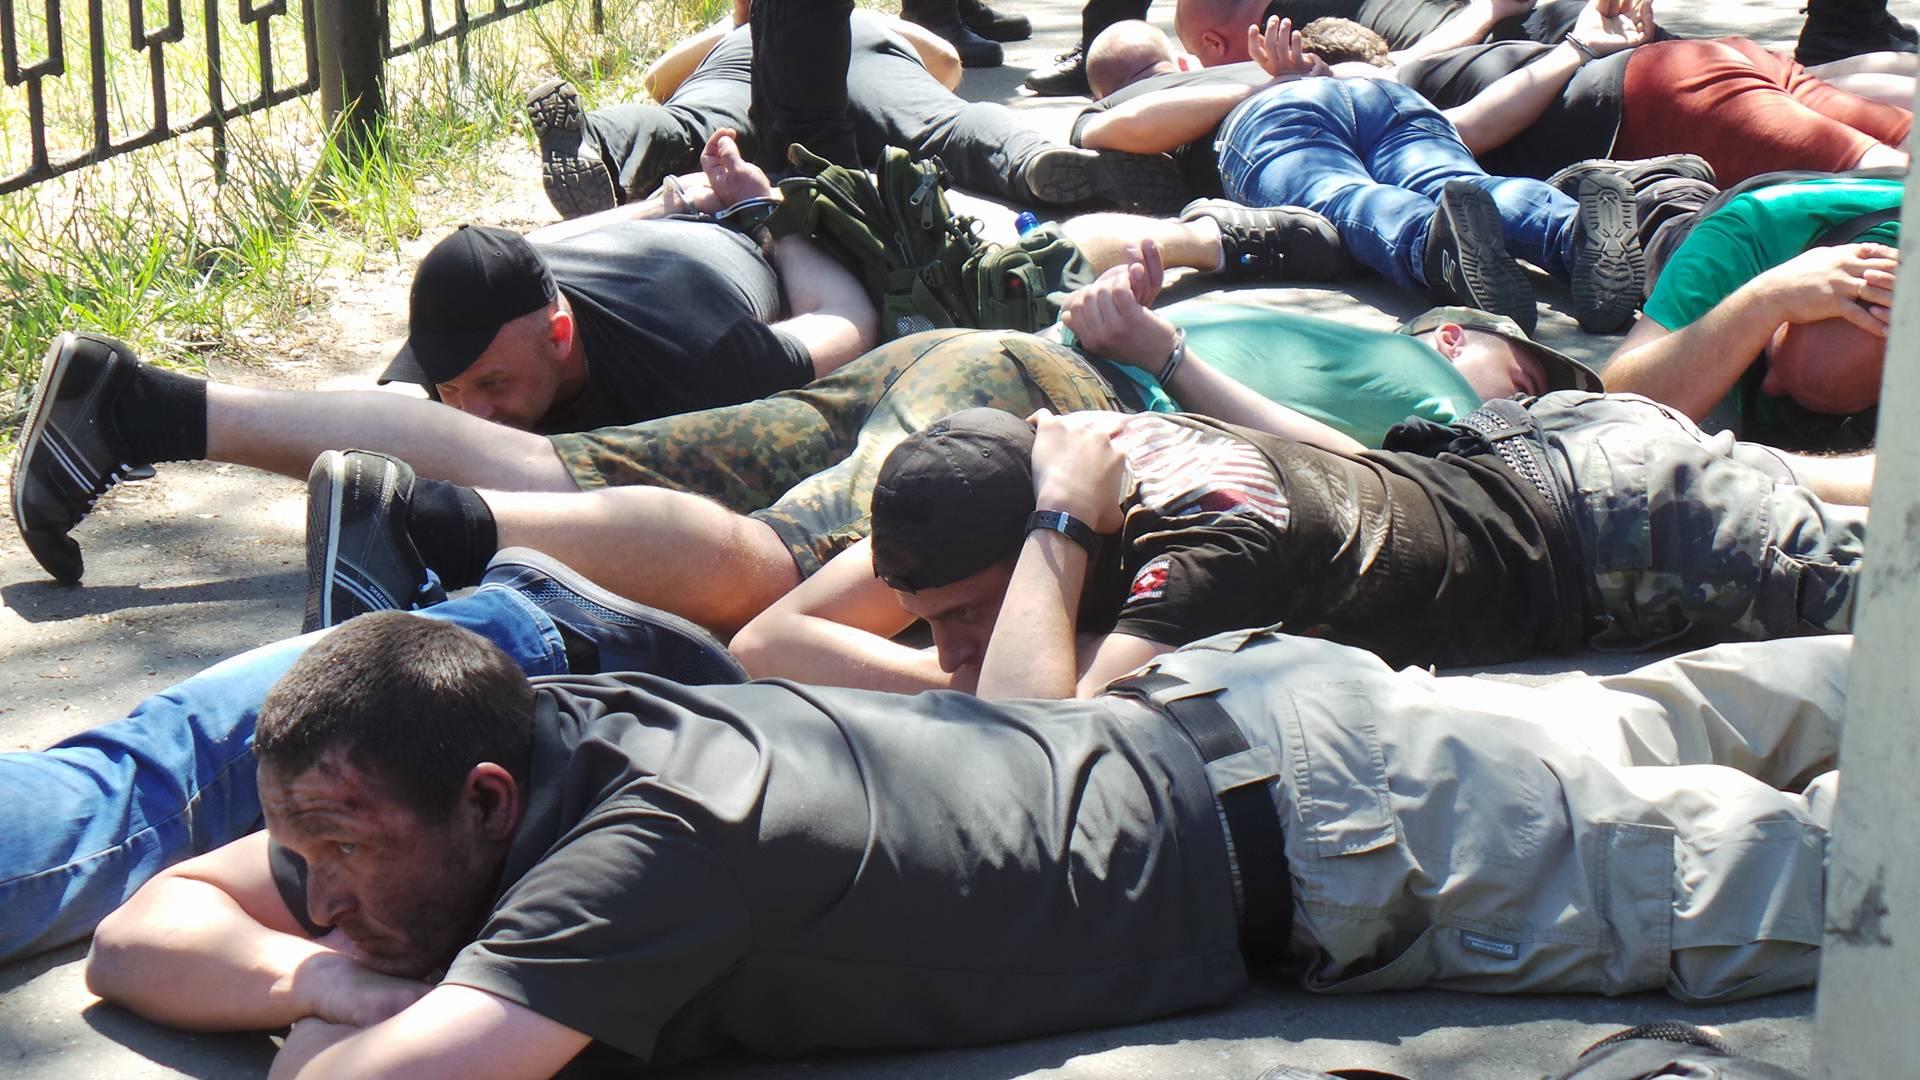 Погром на Лесной — следствие самоустранение государства от процессов арбитража, — Романенко